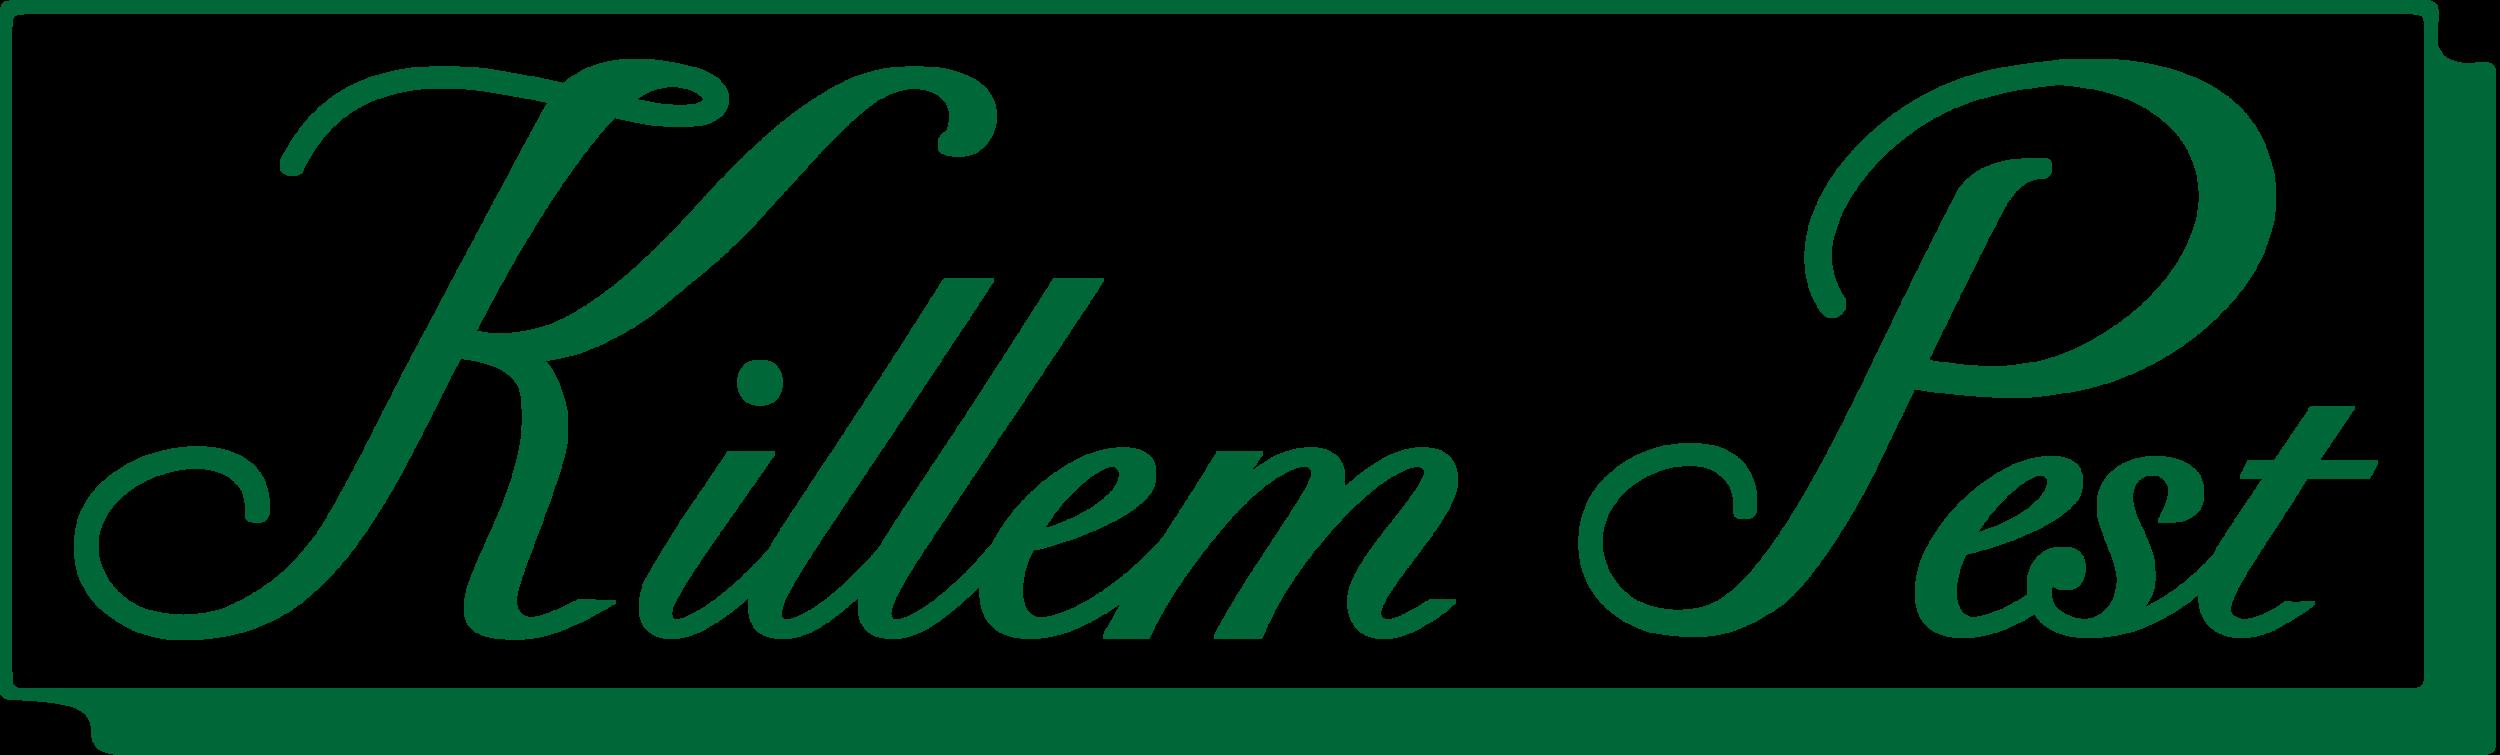 KillemPest_Logo Transparent.png